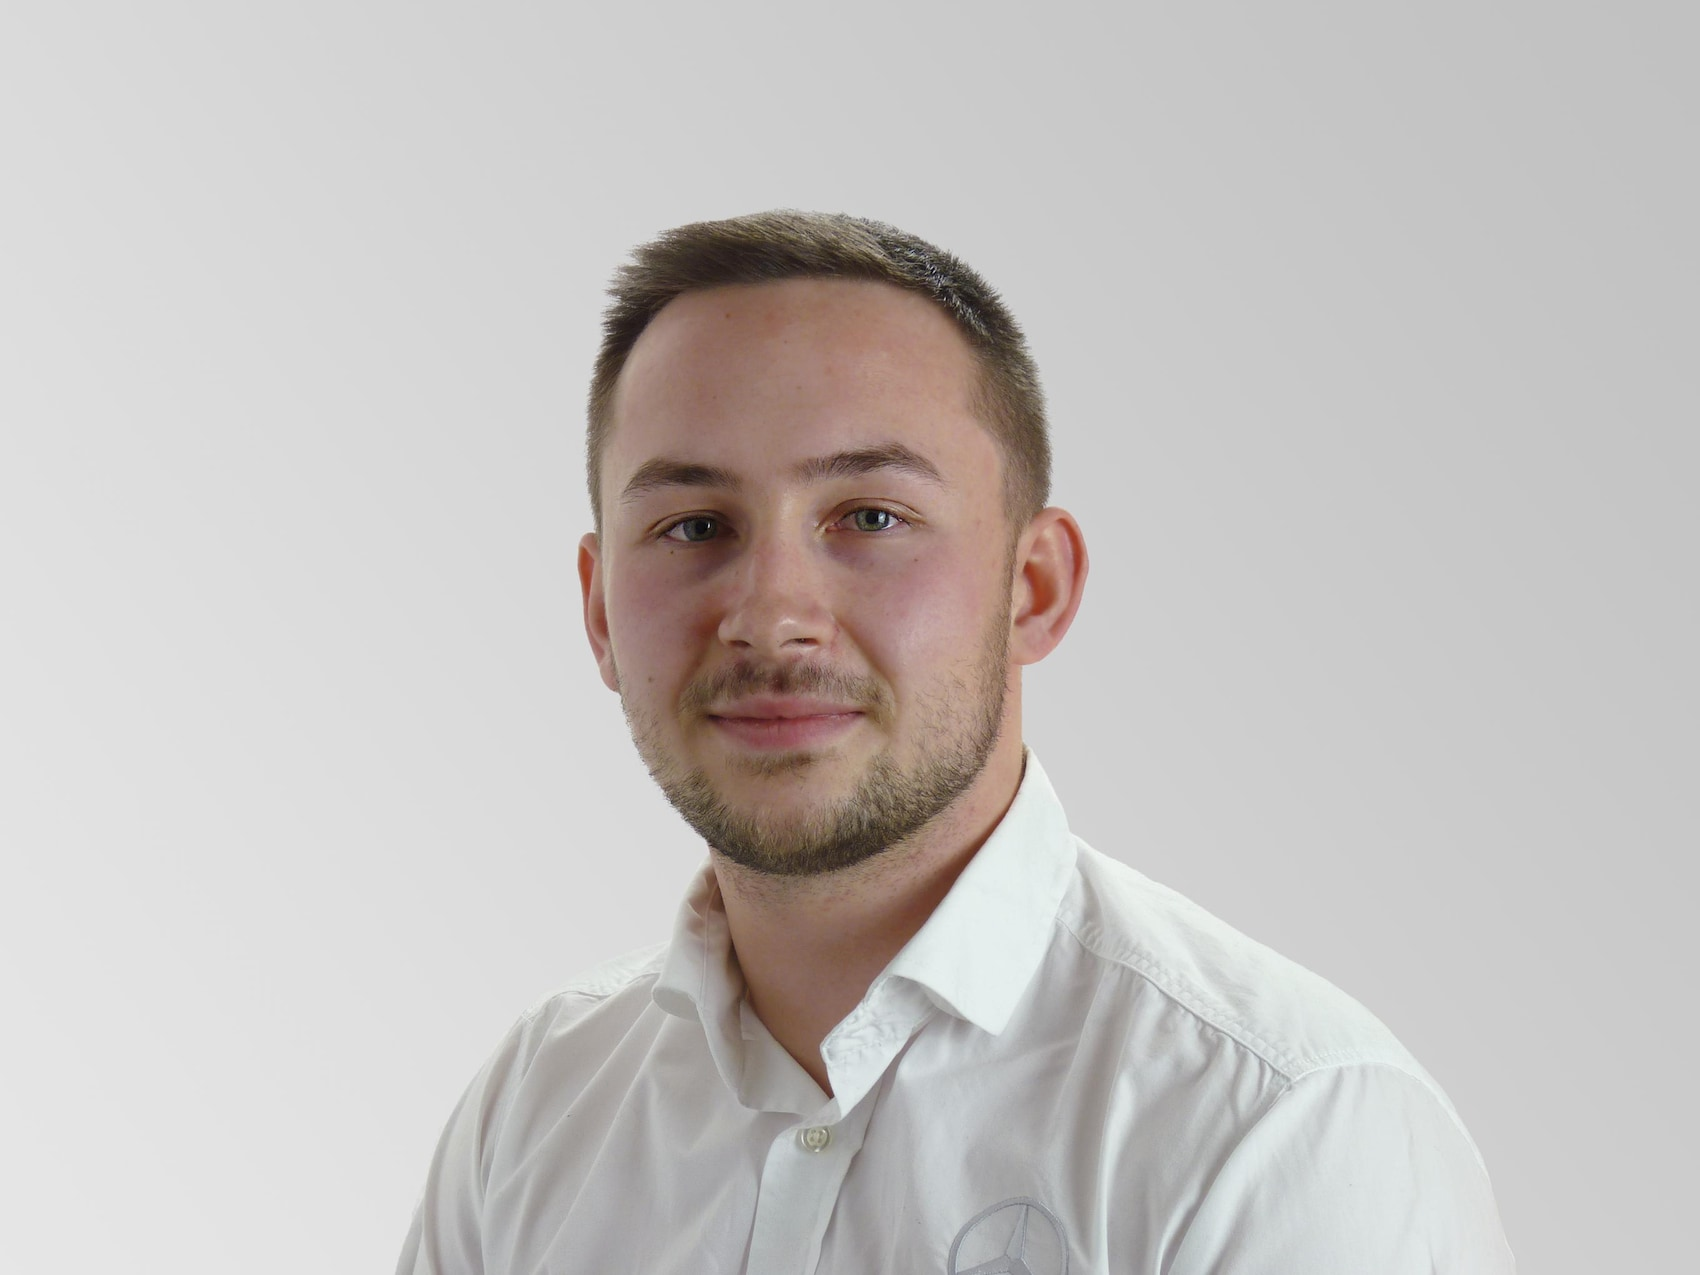 Tobias Lack